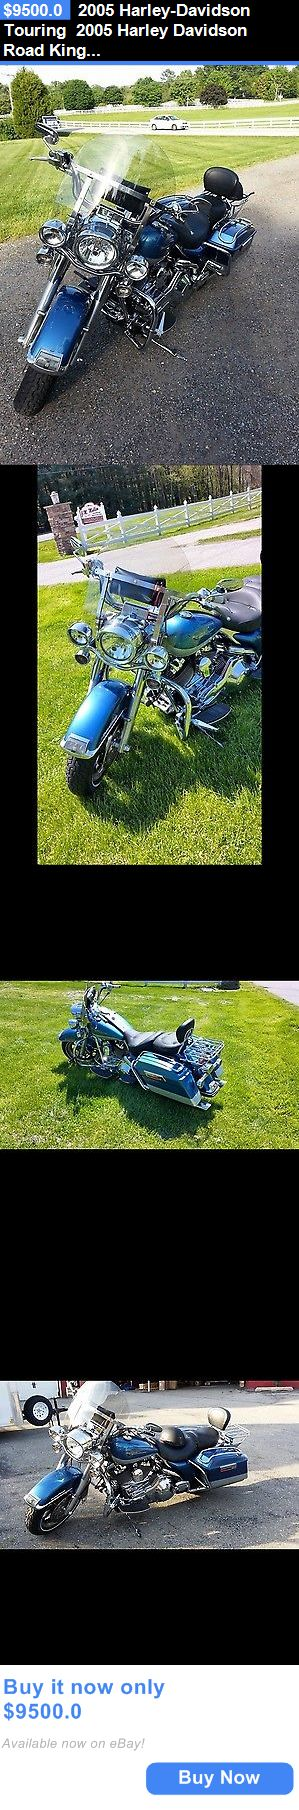 Motorcycles: 2005 Harley-Davidson Touring 2005 Harley Davidson Road King Custom BUY IT NOW ONLY: $9500.0